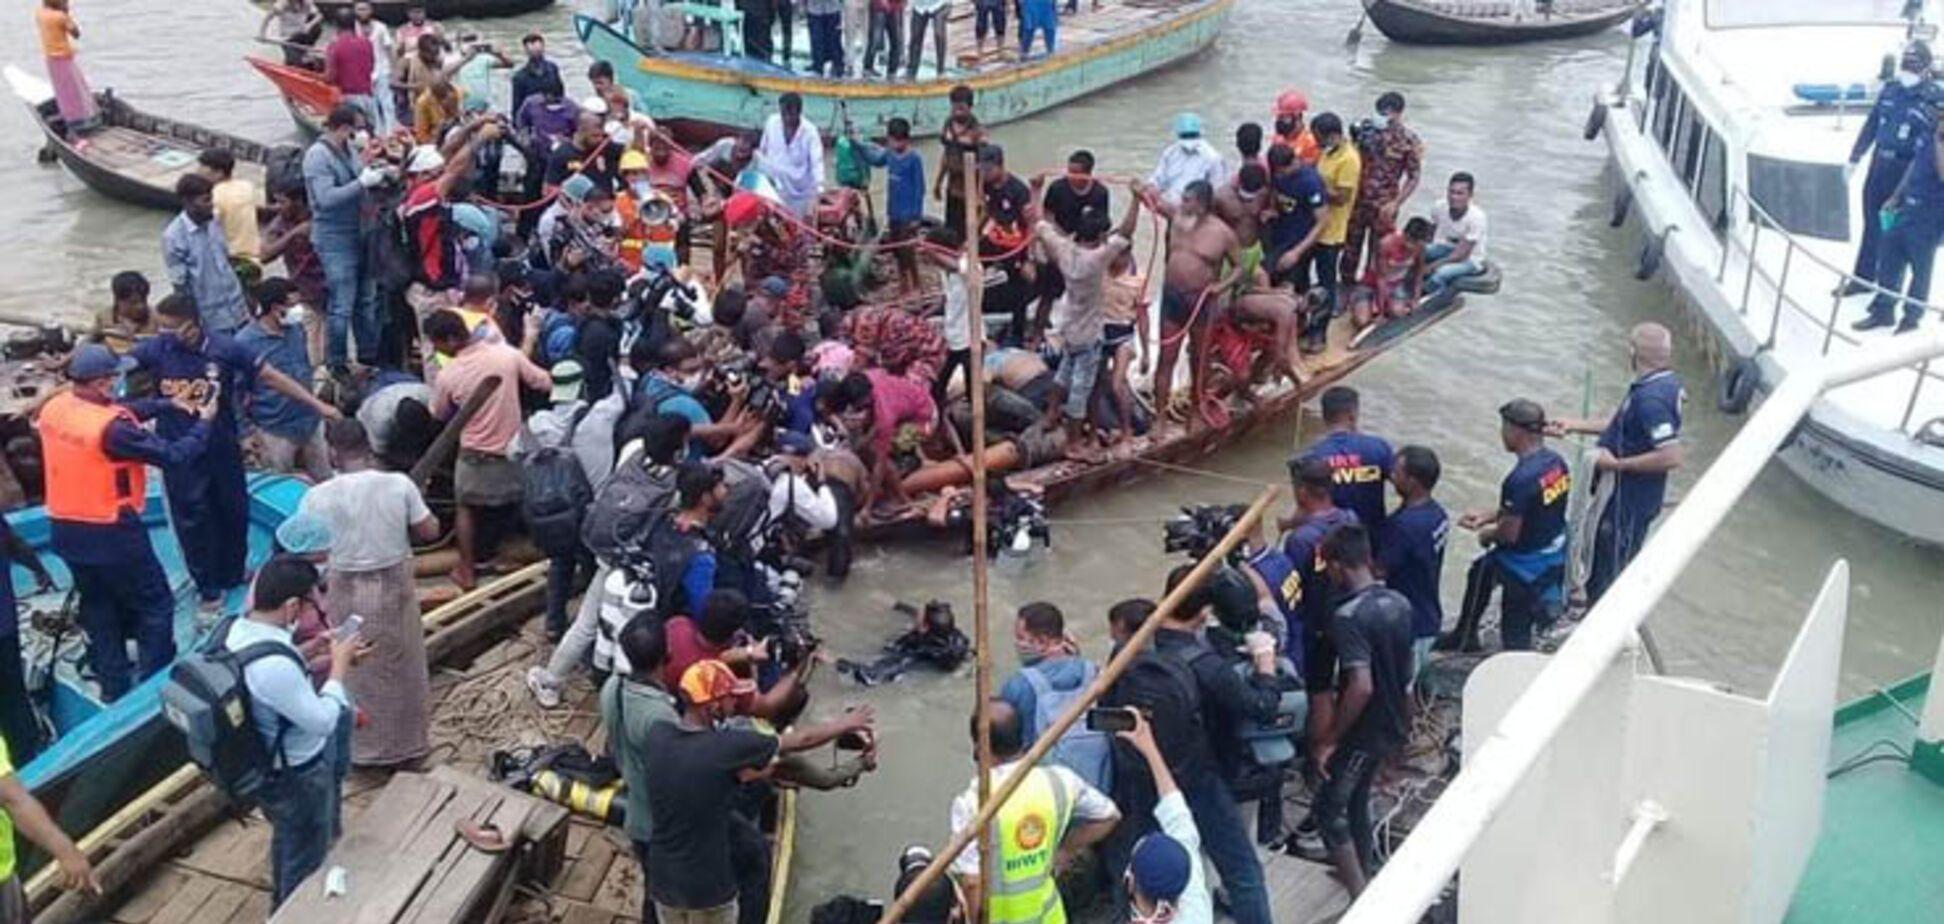 У Бангладеш пором протаранив човен: понад 30 жертв